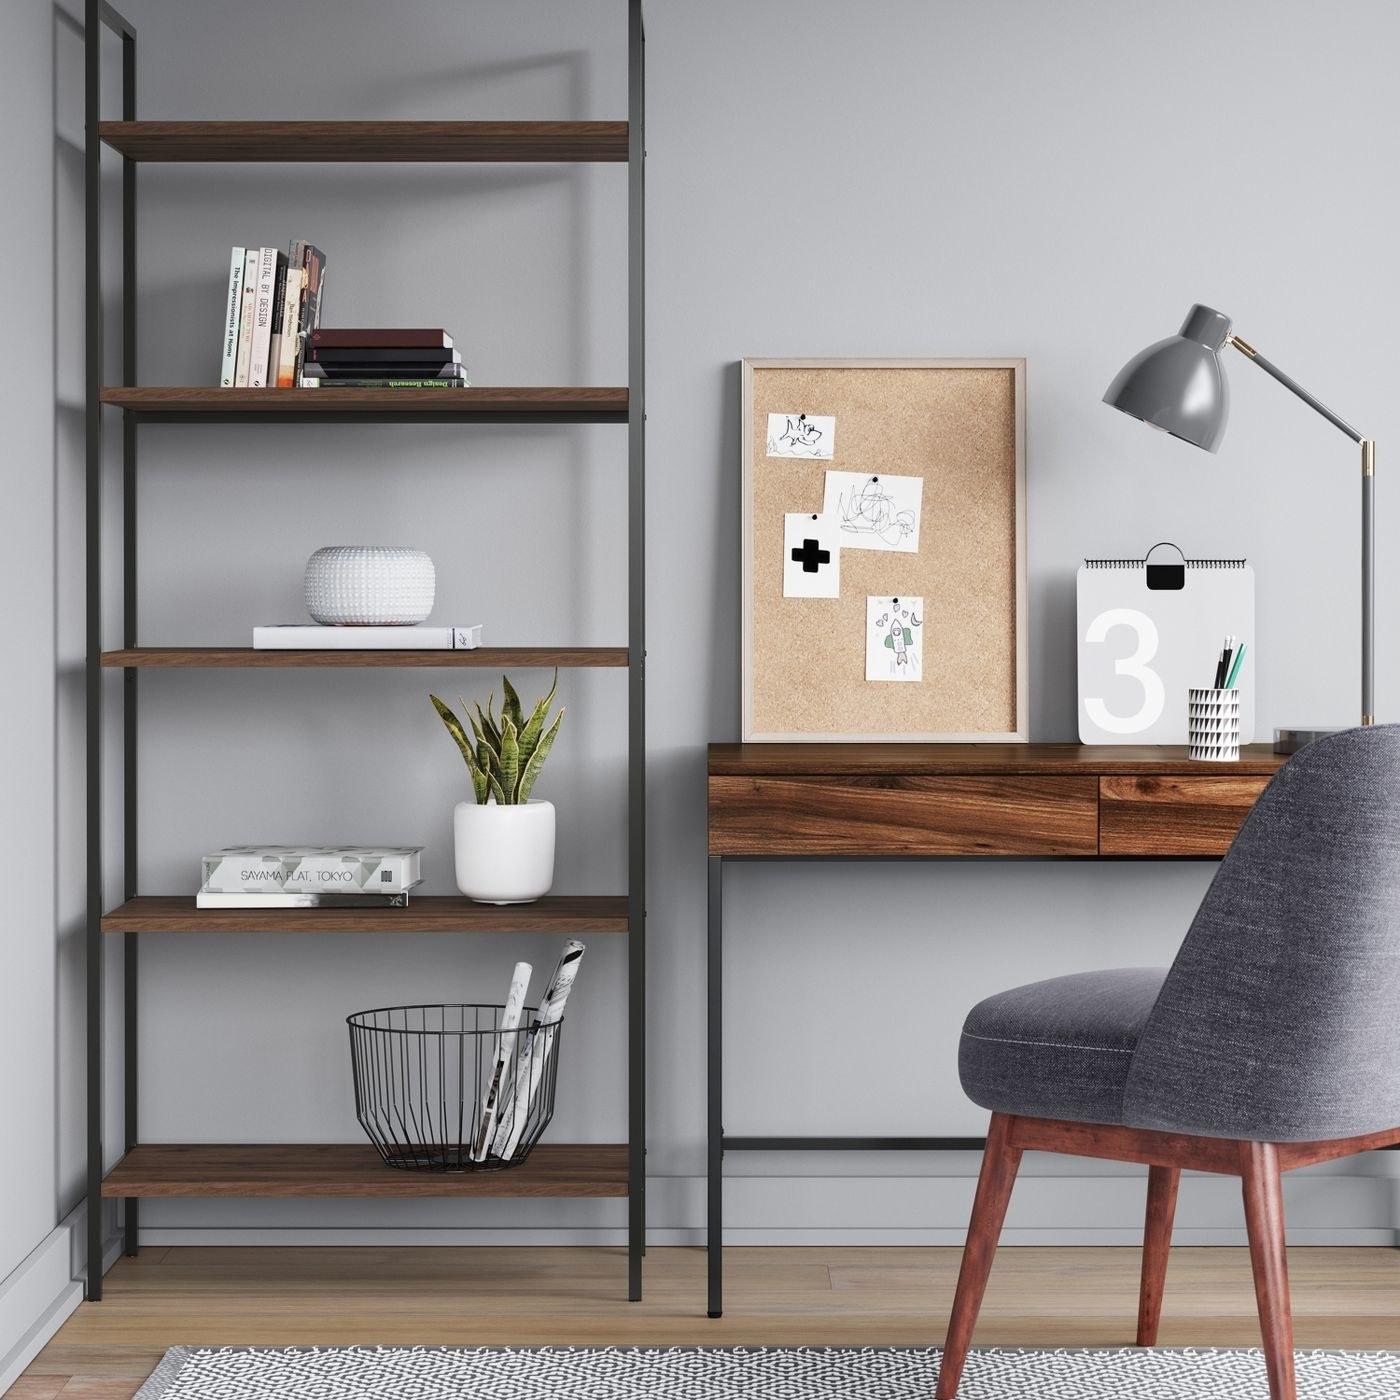 A metal and wood bookshelf in a home